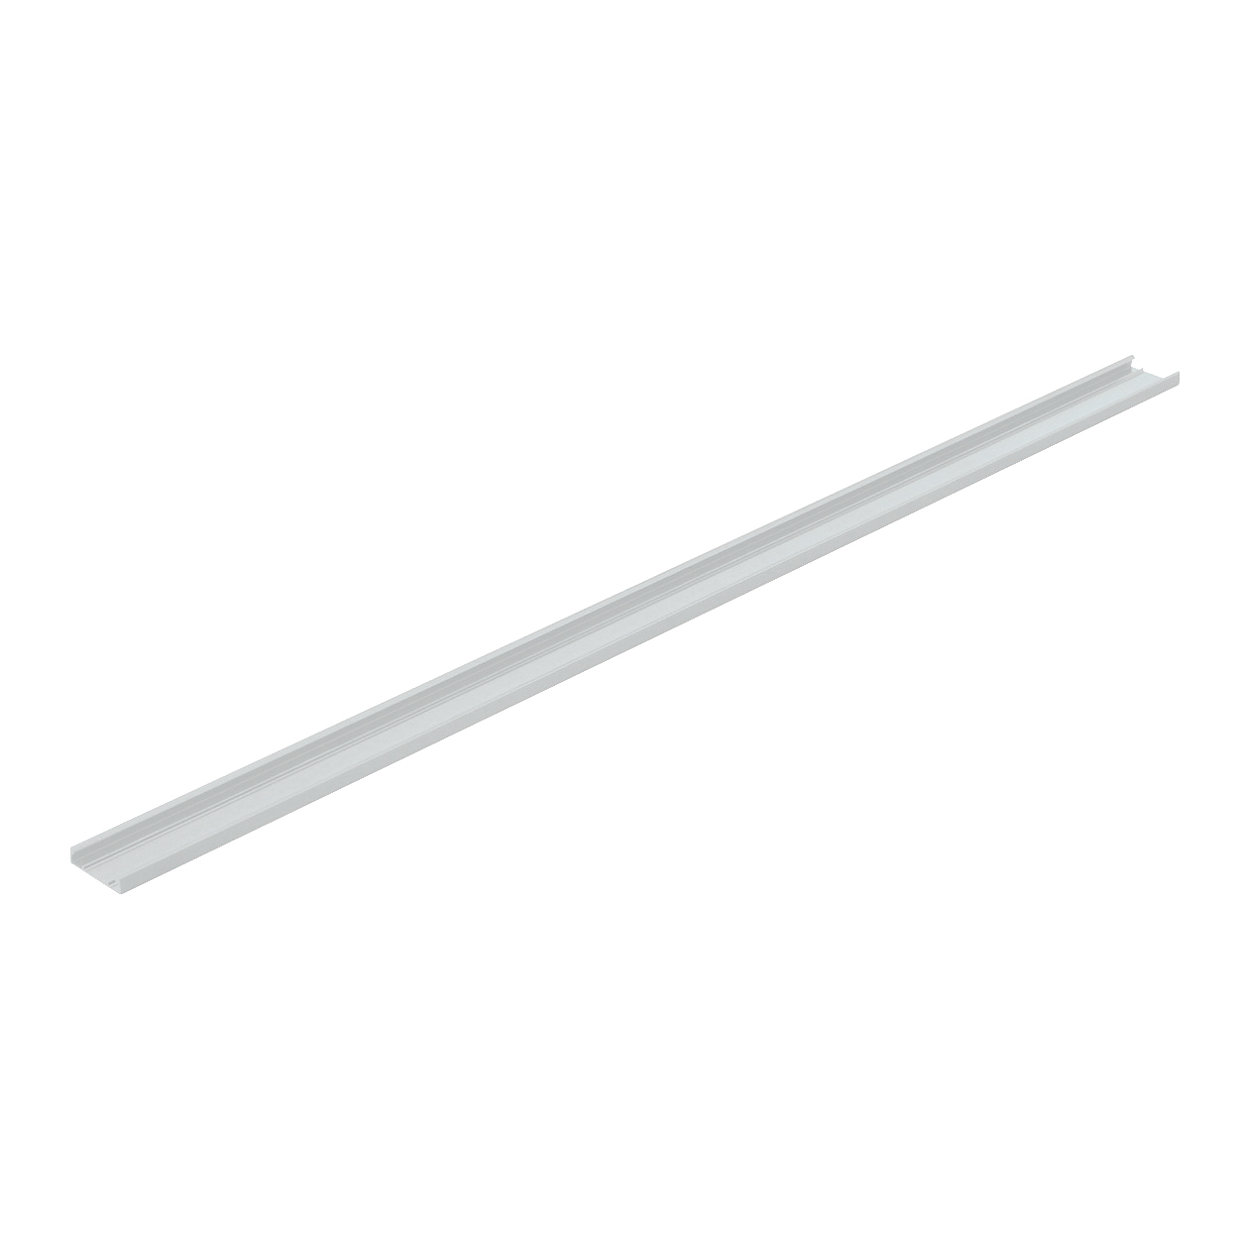 eW Cove QLX Powercore – affordable, high-output linear cove light